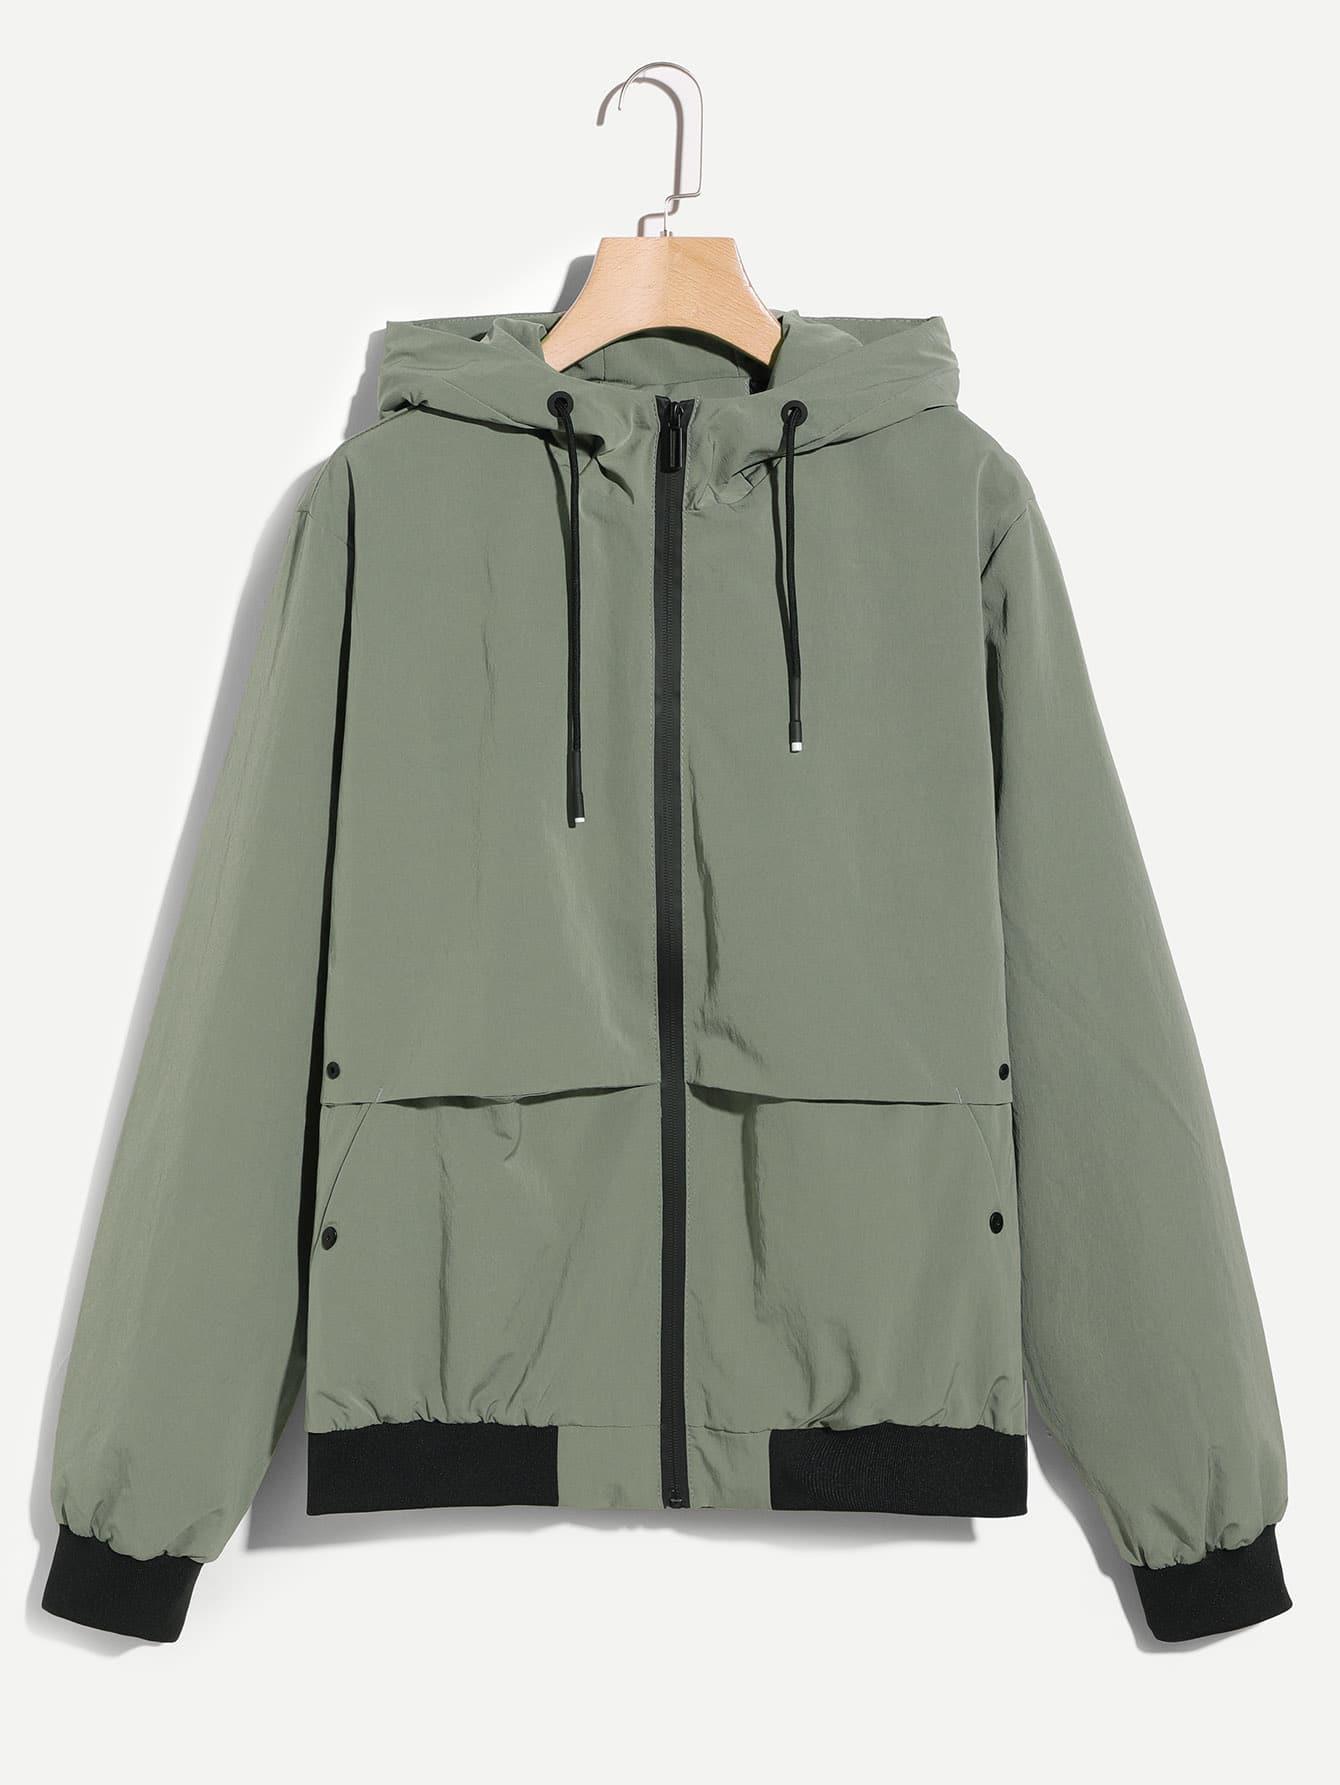 Männer Einfache Jacke mit Kapuze